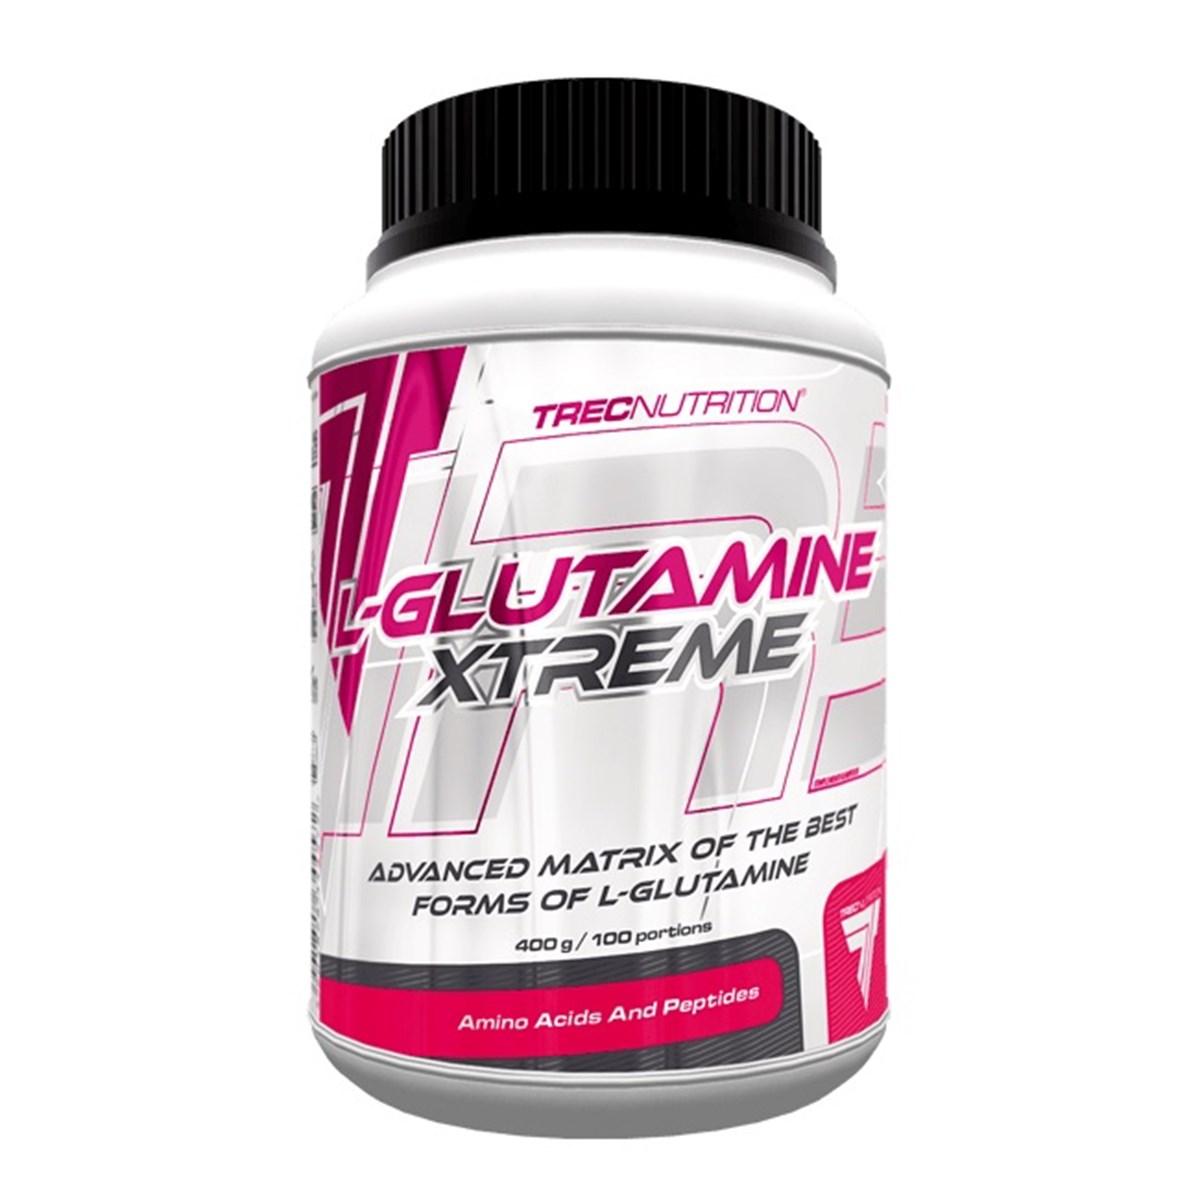 L-Glutamine_Extreme_i1113_d1200x1200.jpg